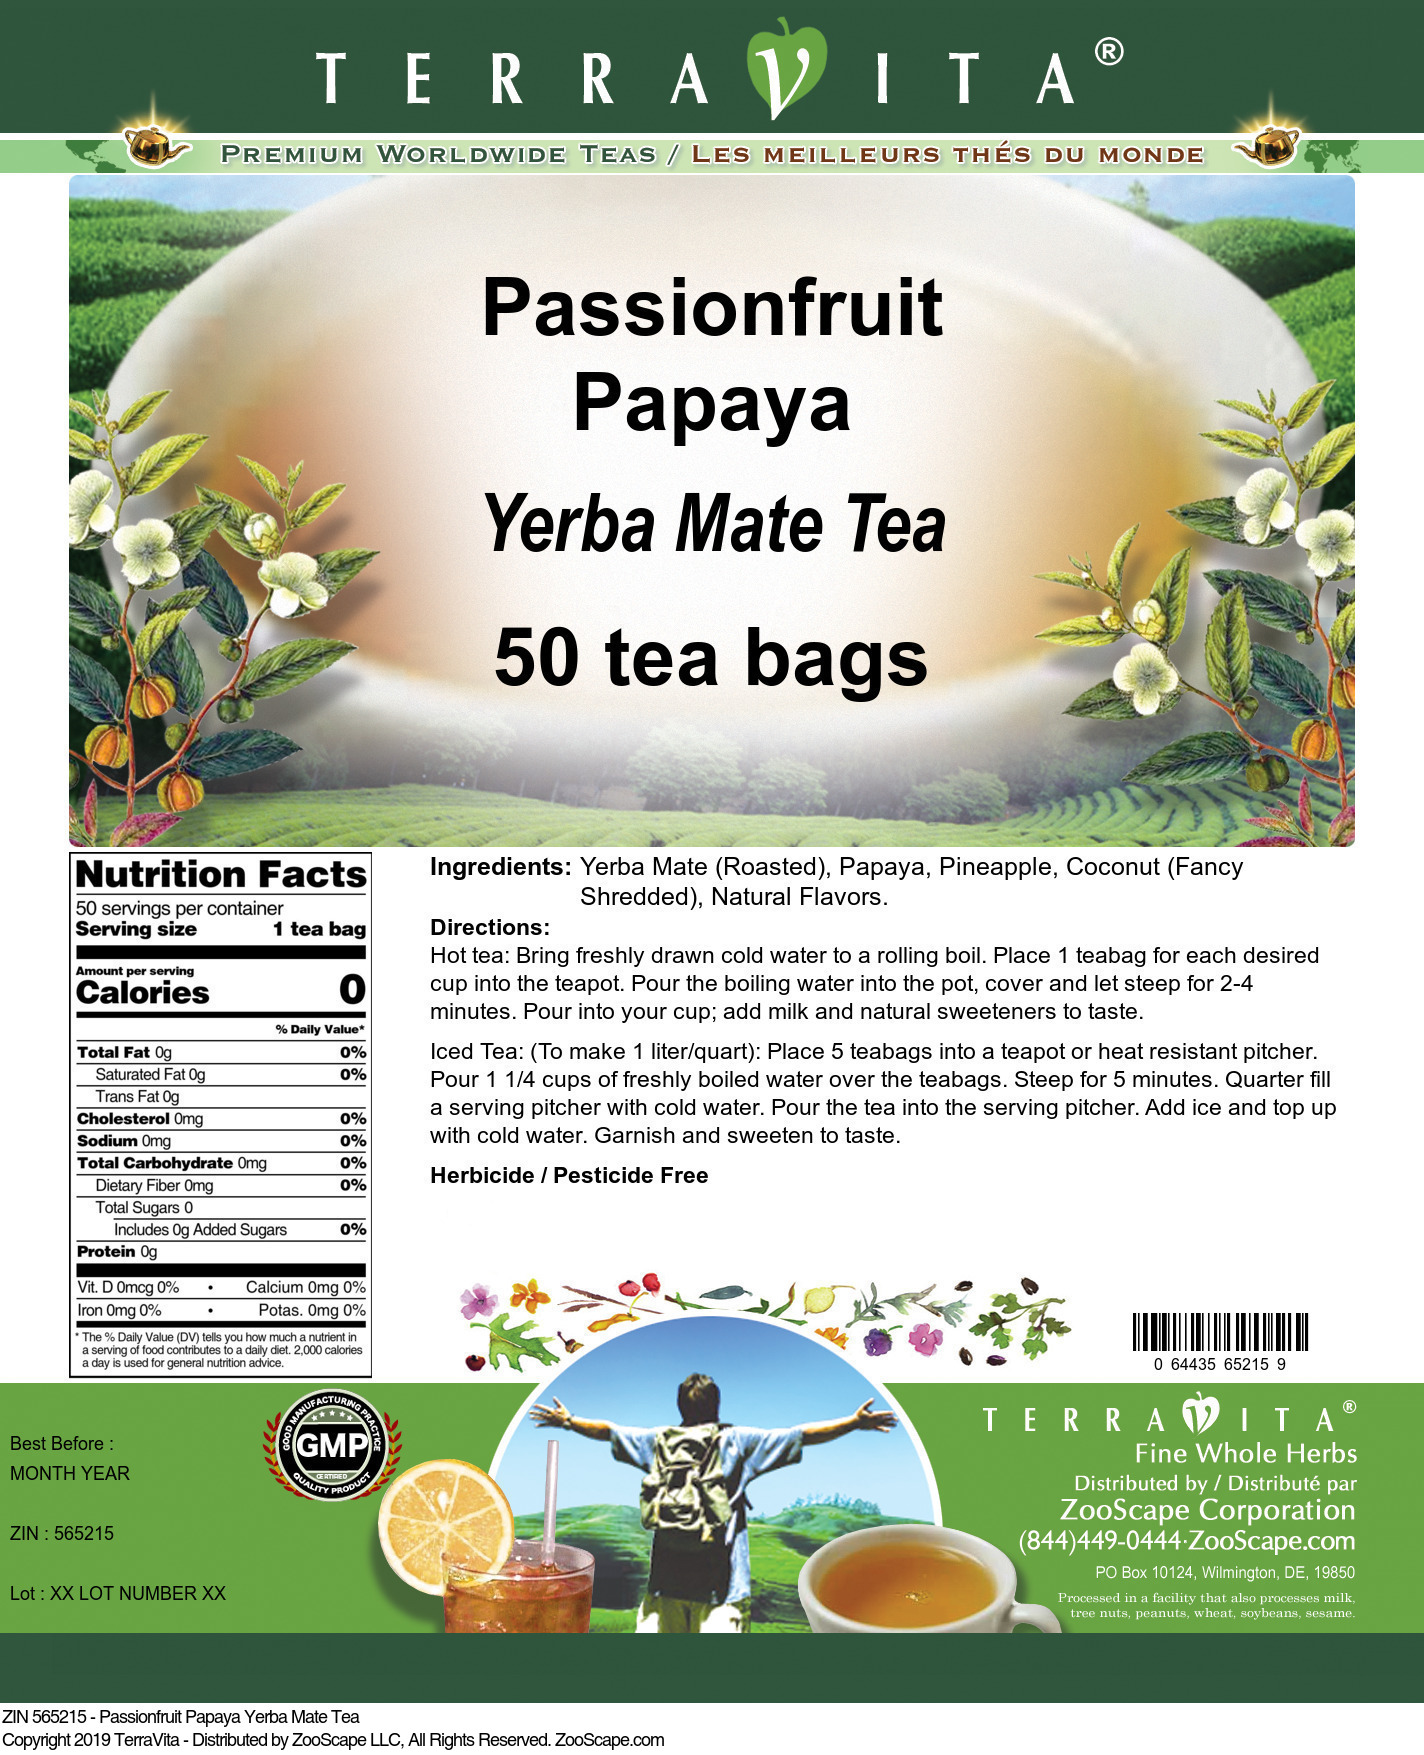 Passionfruit Papaya Yerba Mate Tea